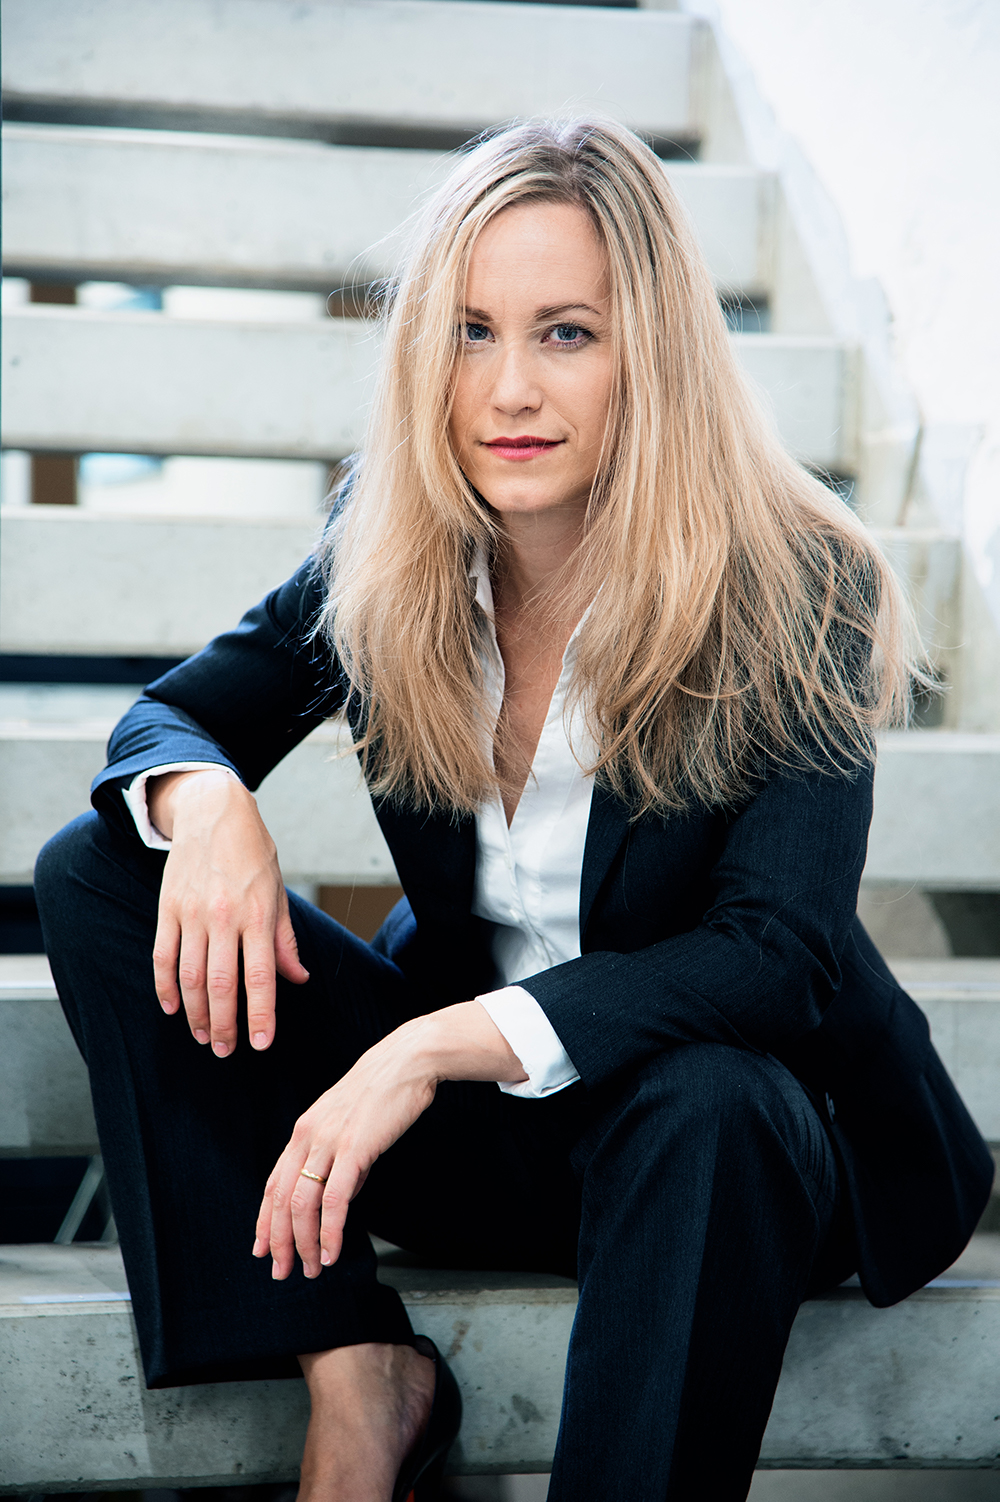 Nadine, Pianistin & Model